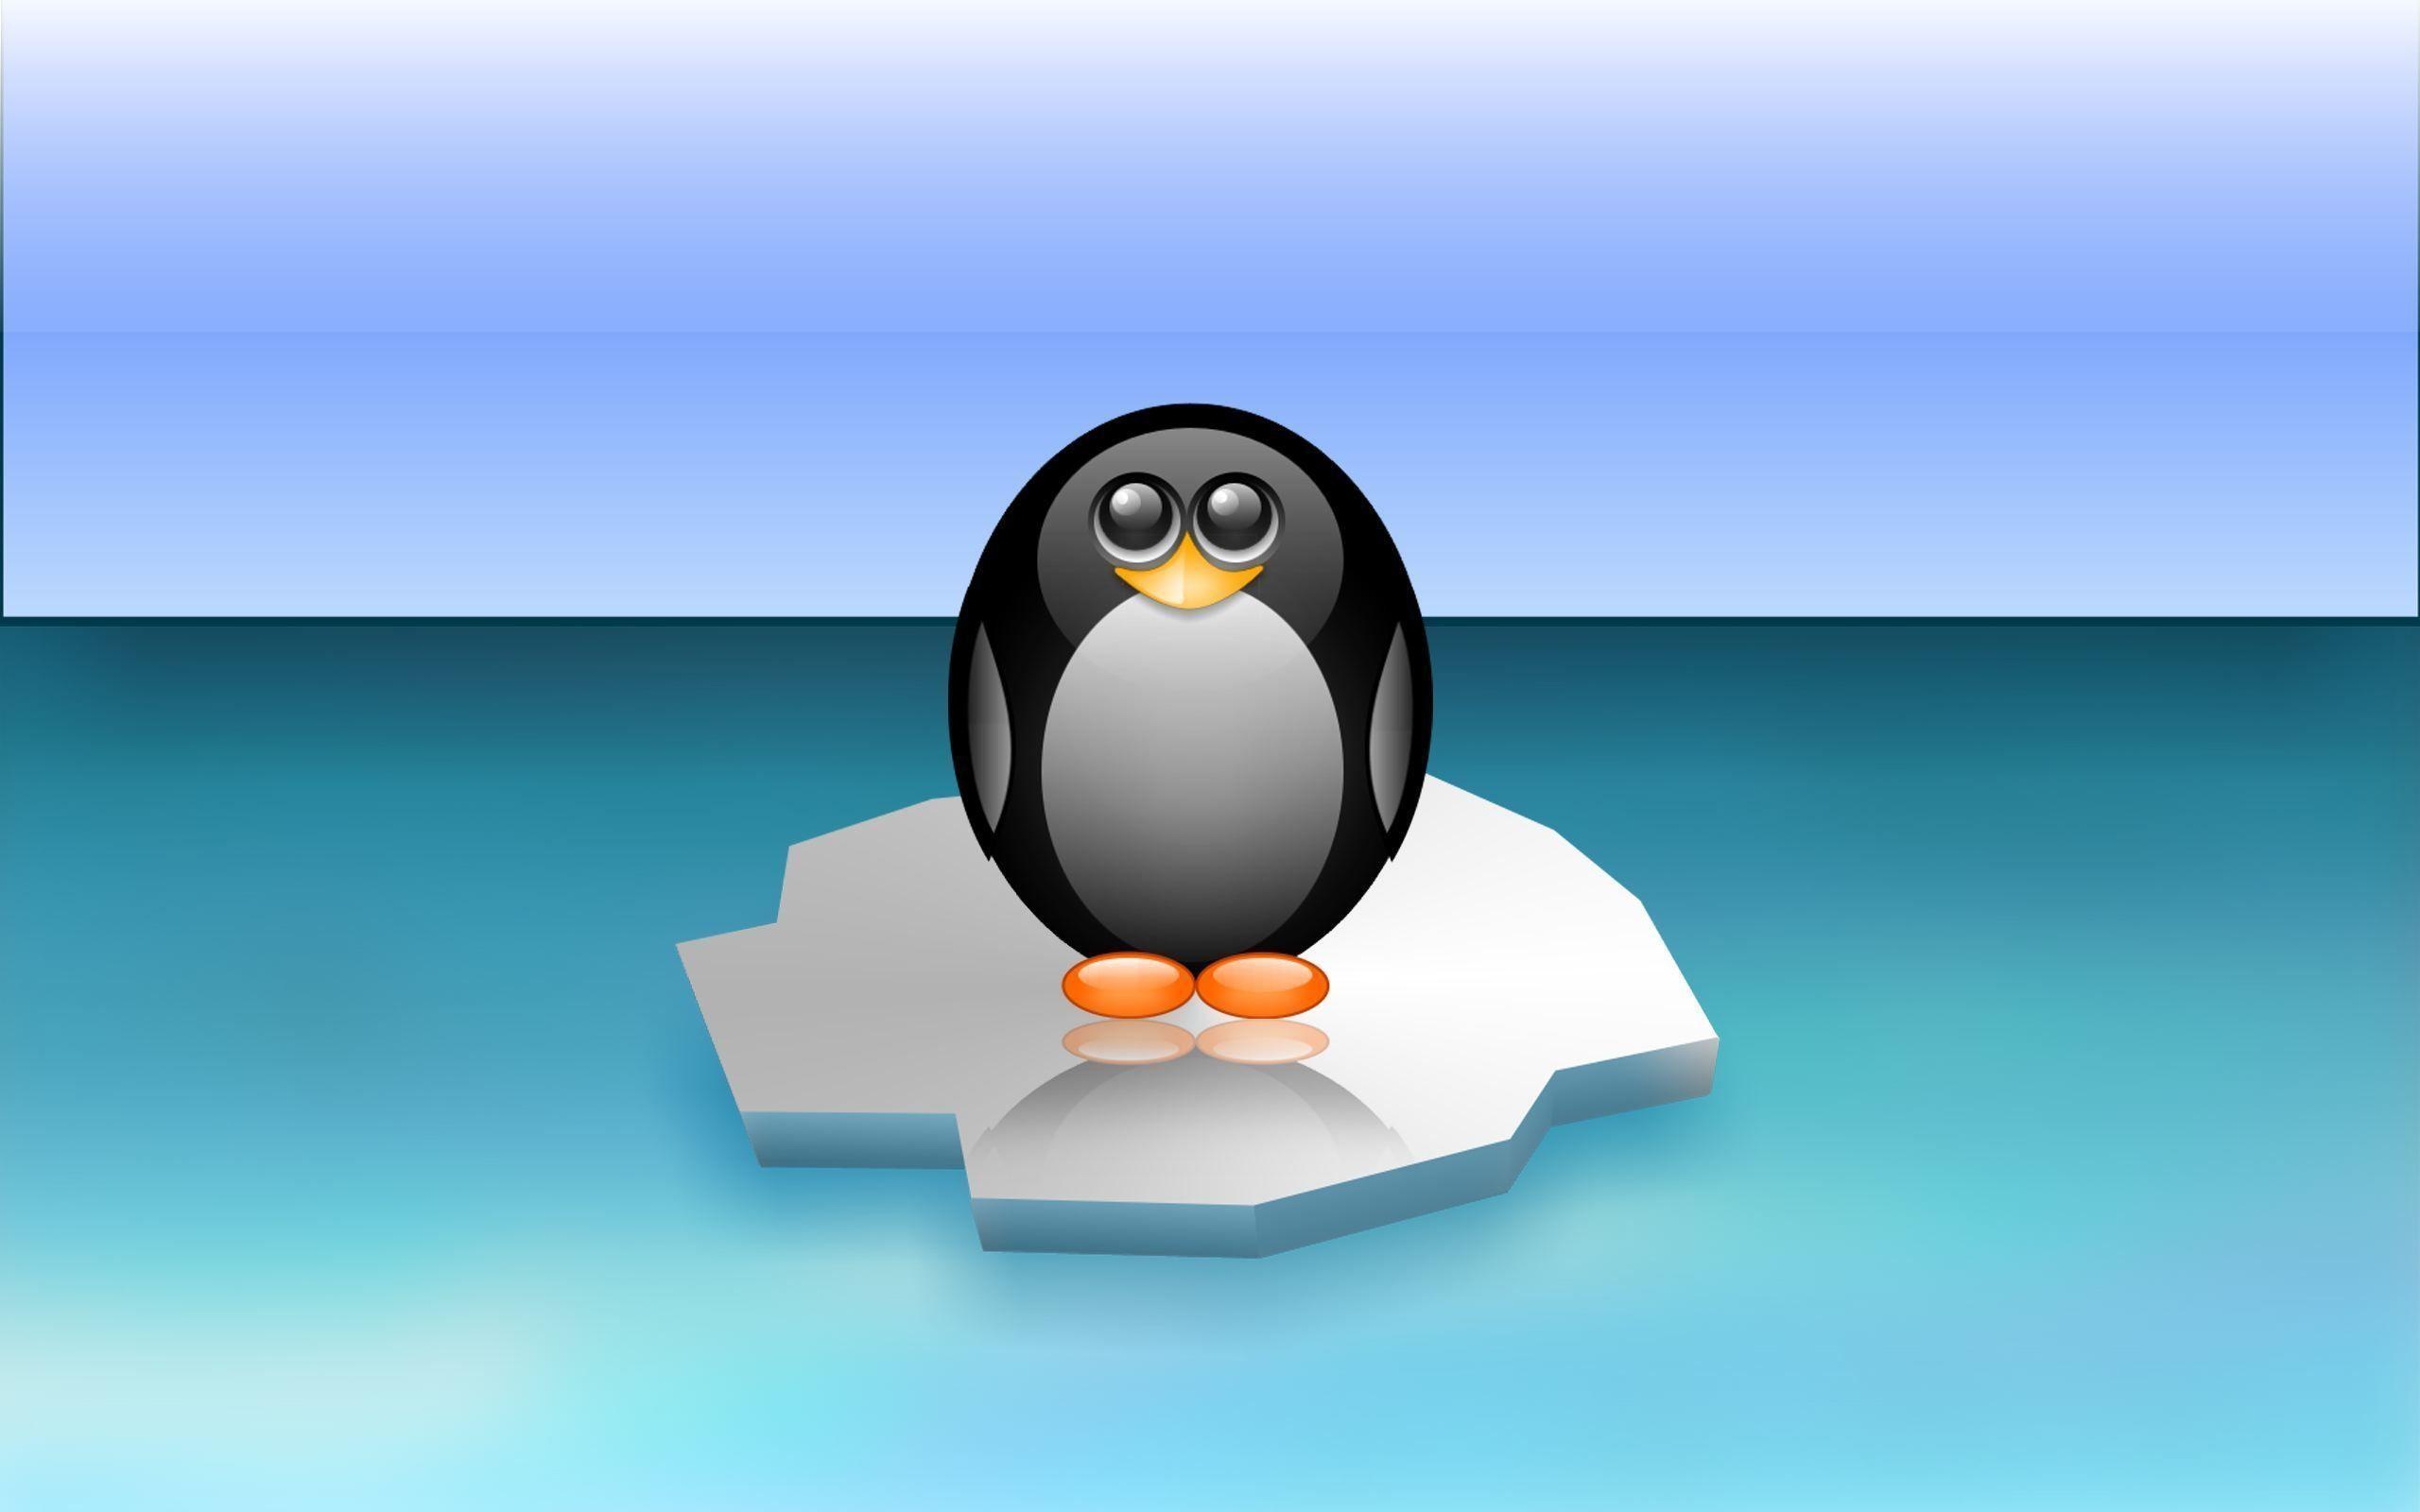 2048x1536 Tablet Android 1024x600 1280x1280 Wallpaper Description Title Cute Penguin Wallpapers Picture